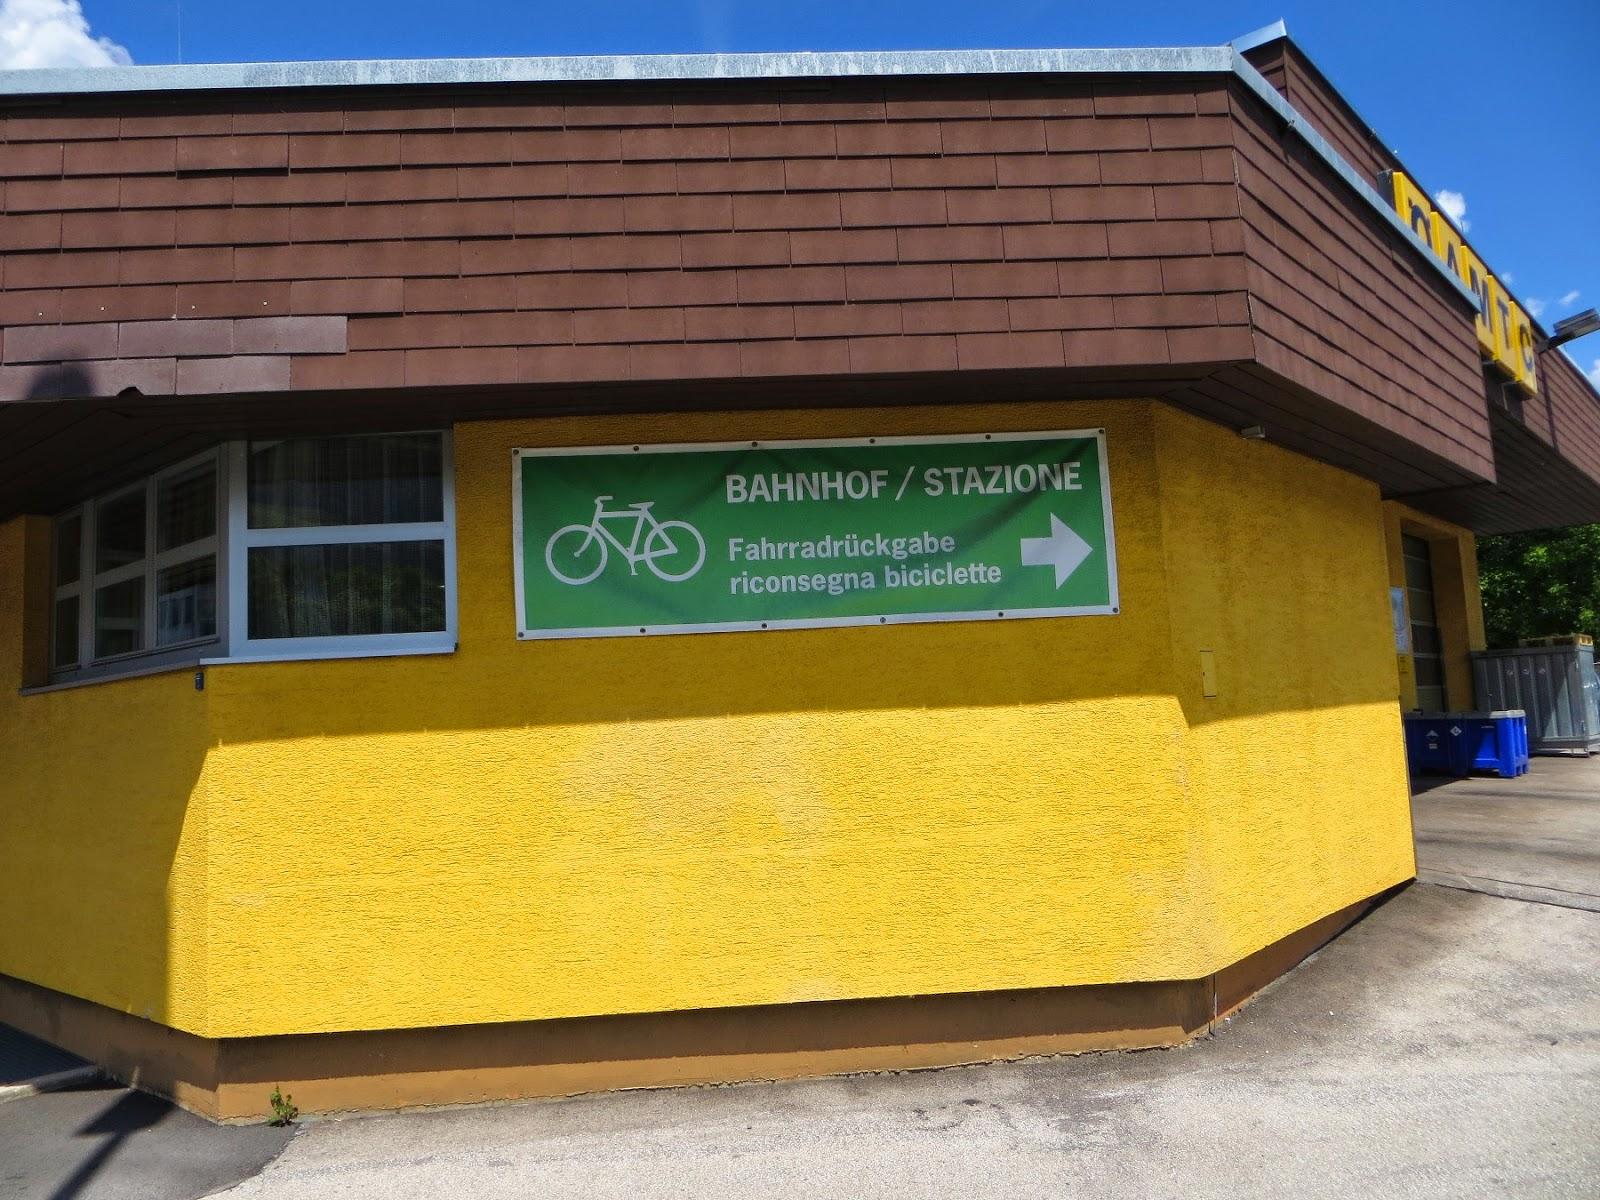 pista ciclabile san candido lienz noleggio bici